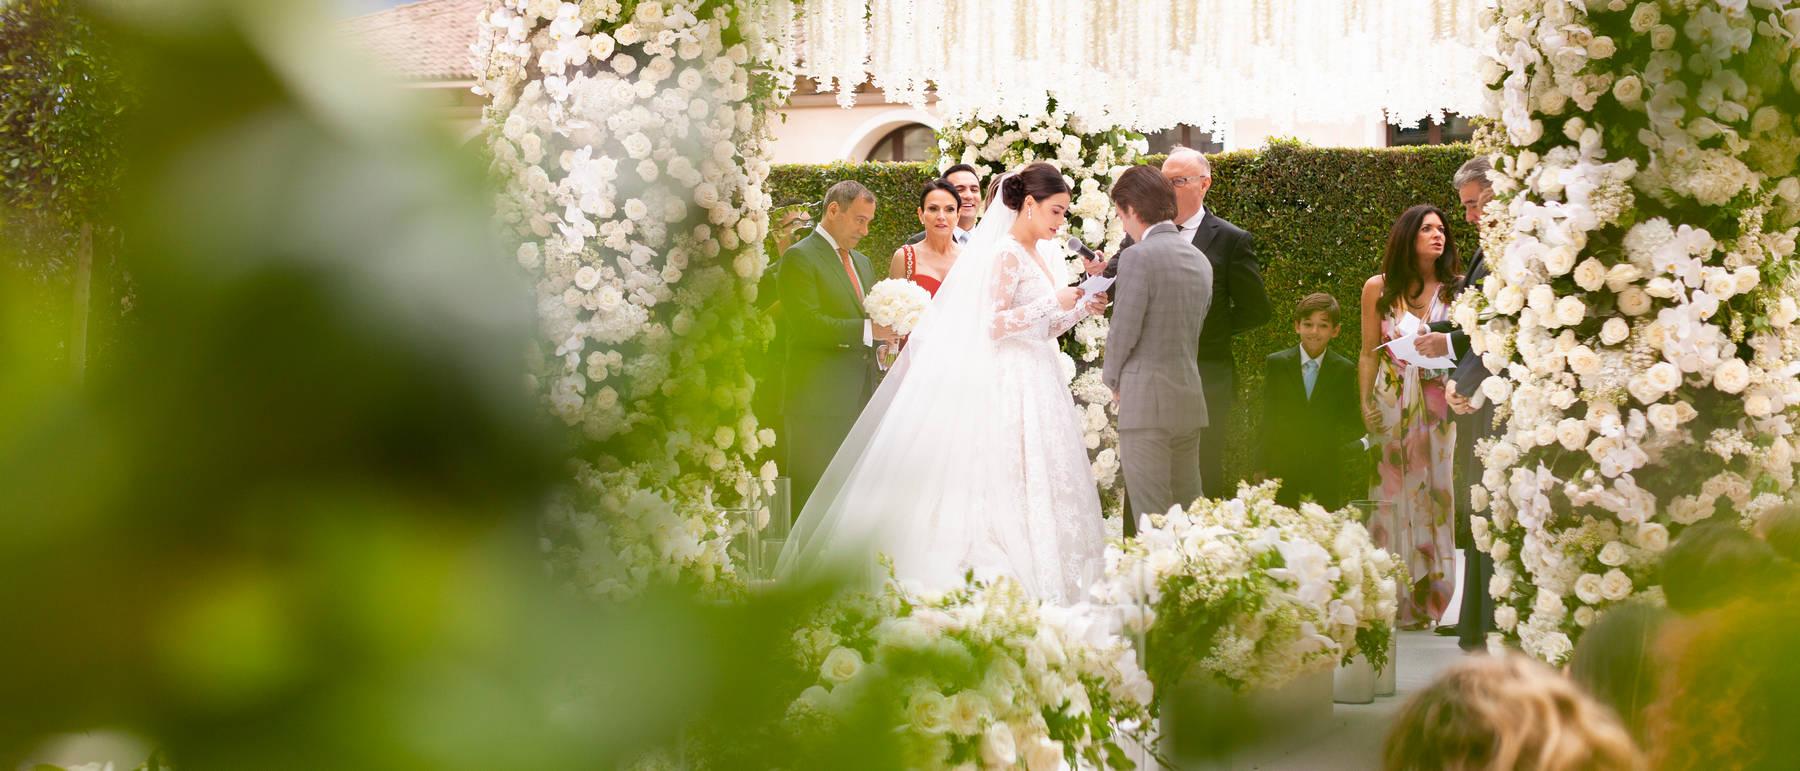 johnandjoseph-wedding-photographer-hz-slider-256